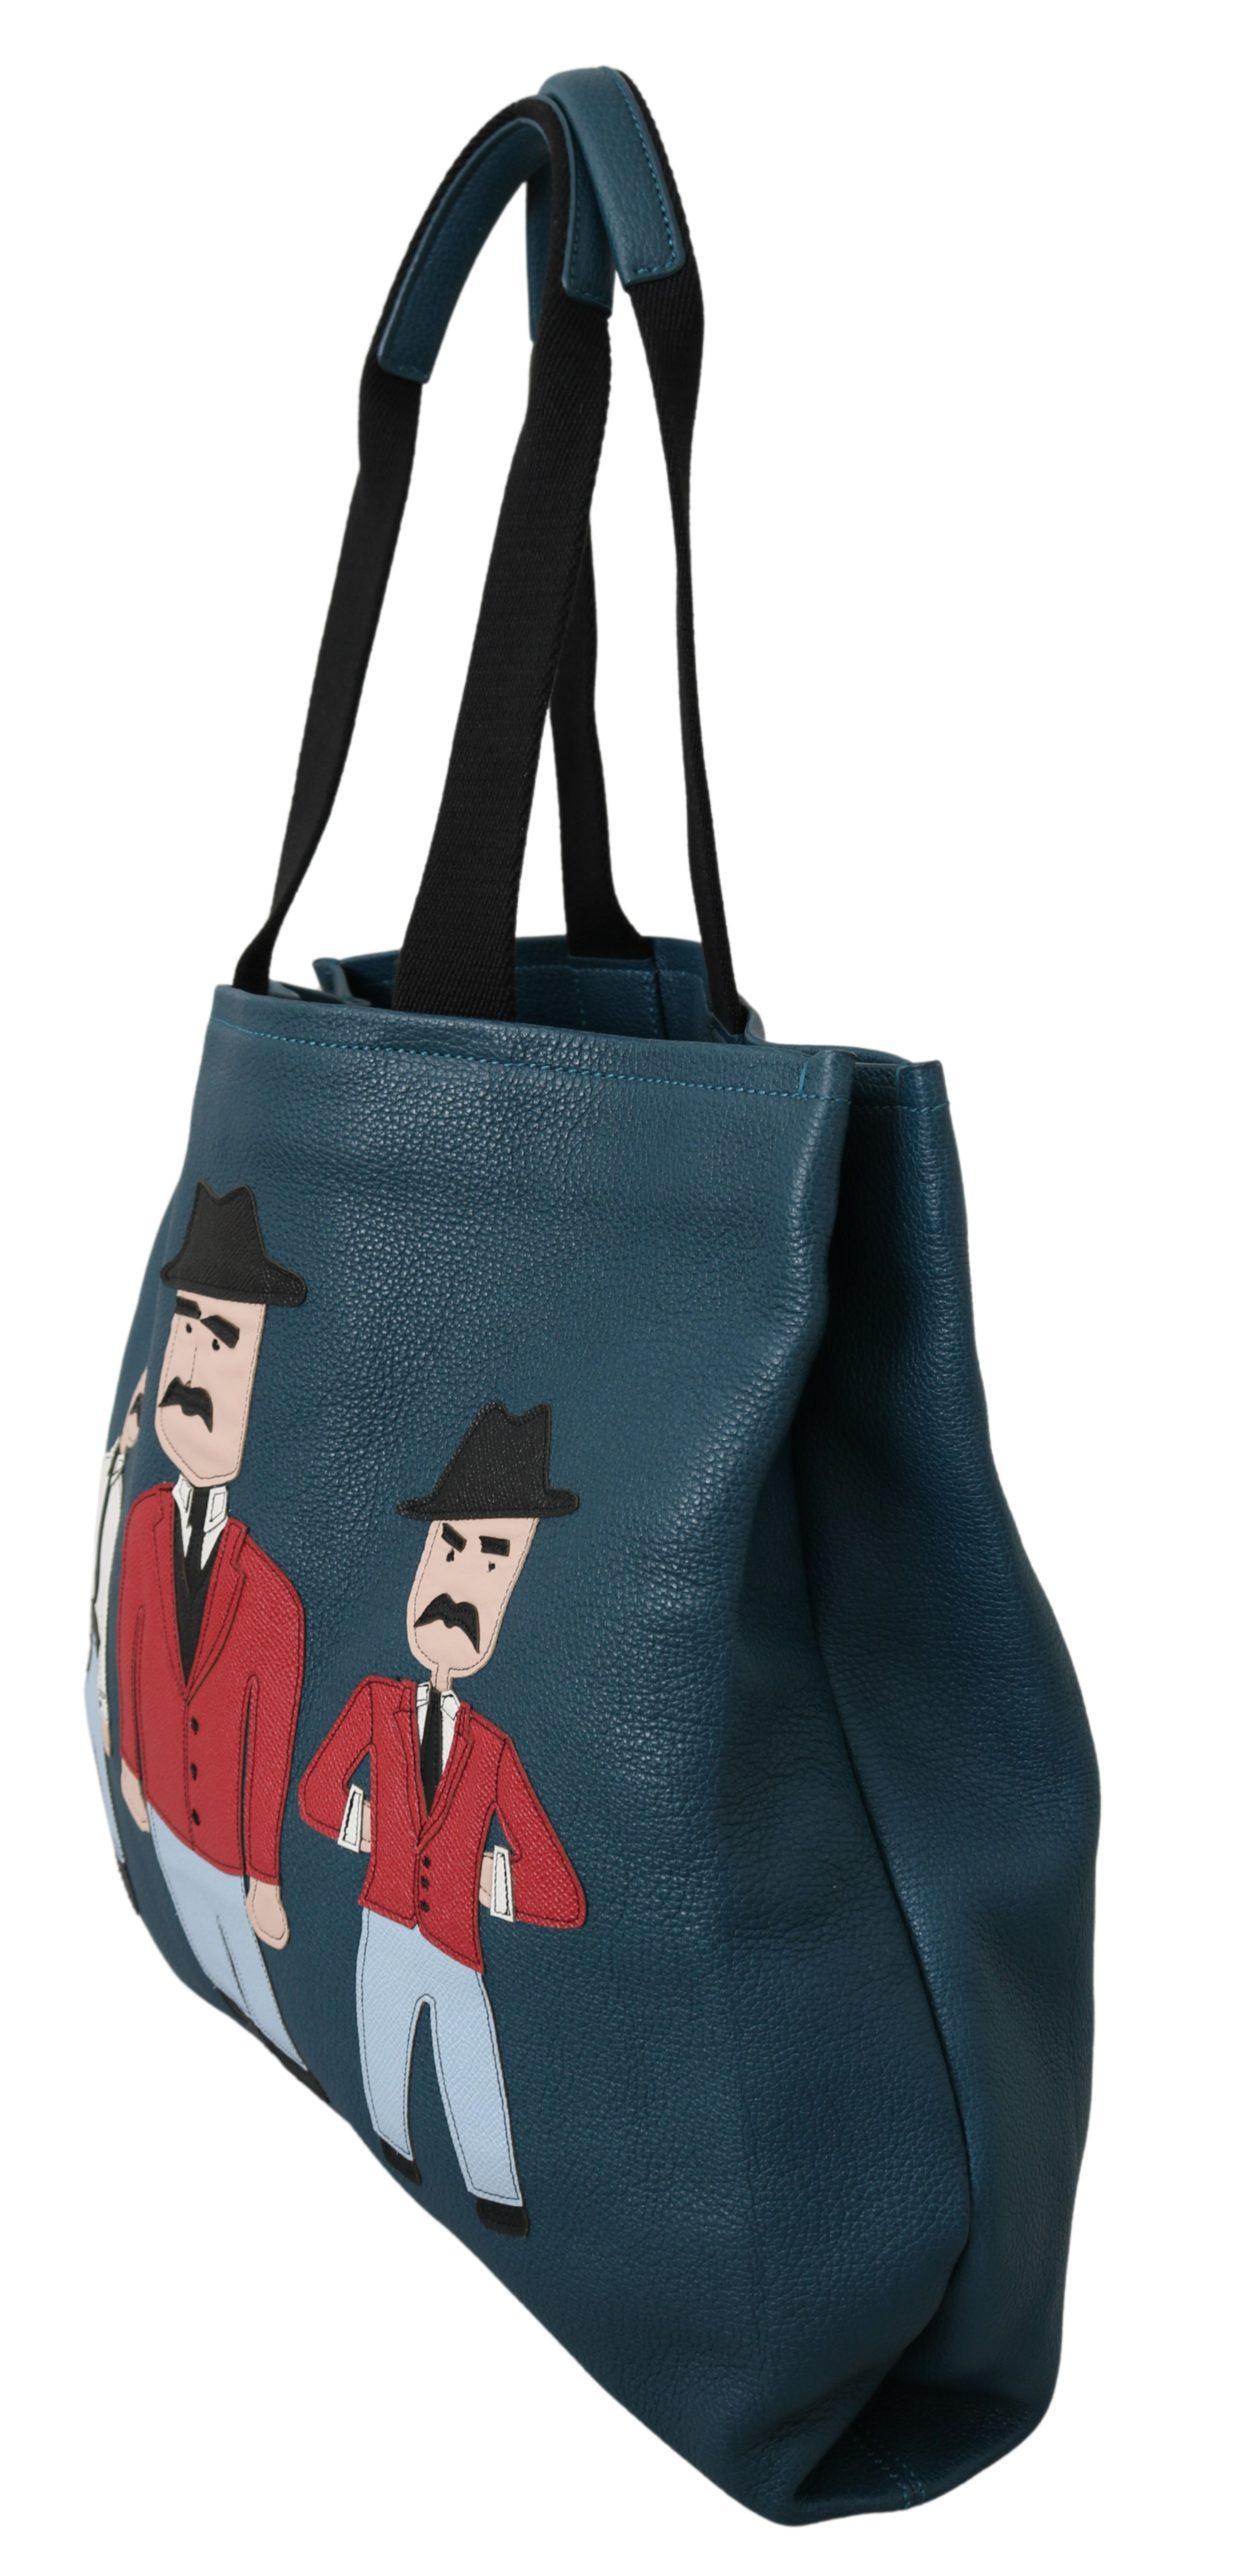 Dolce & Gabbana Men's Patched Leather Tote Bag Blue VAS9606